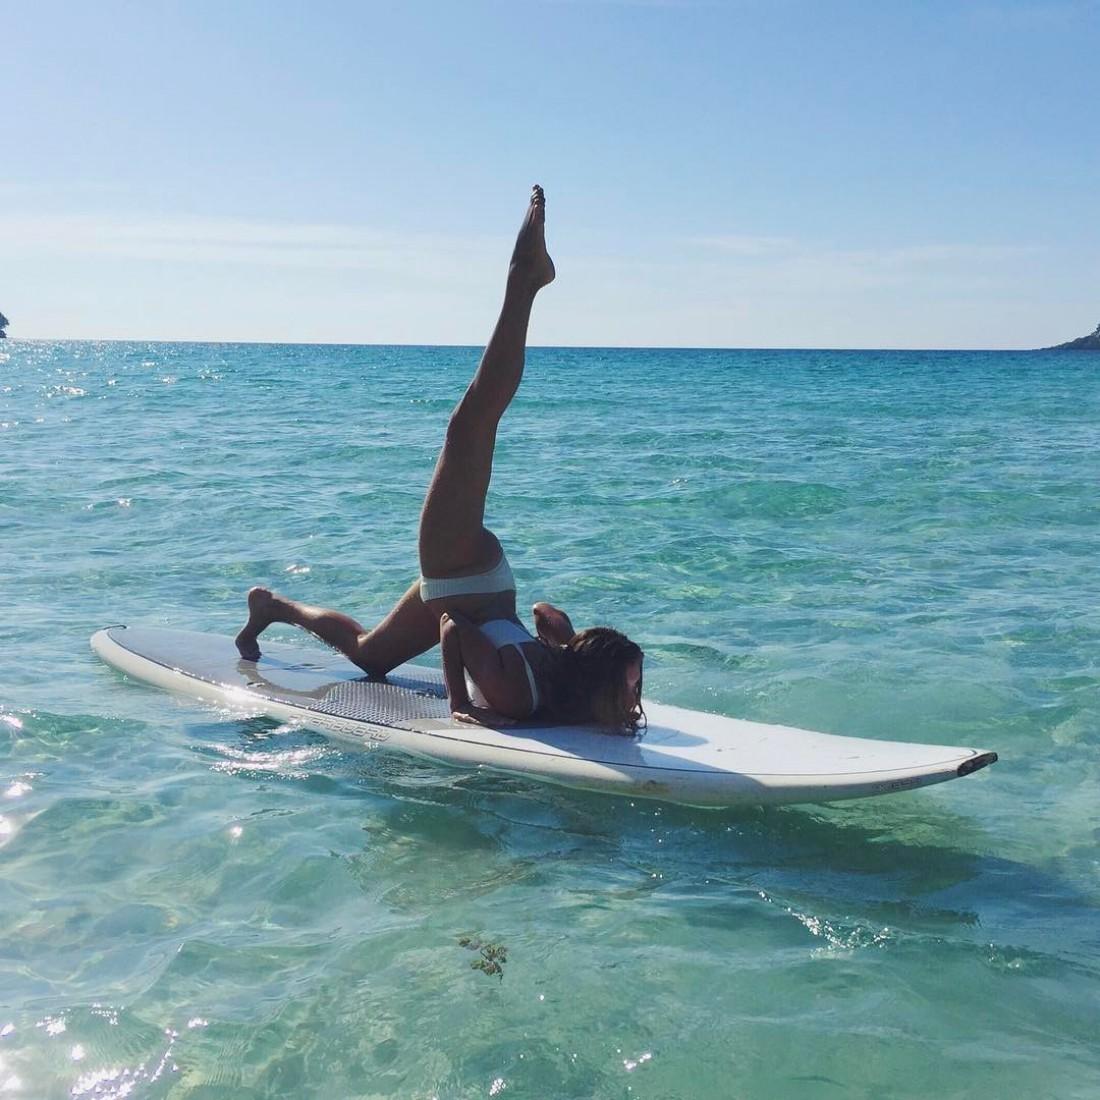 Тодоренко на серфинг доске